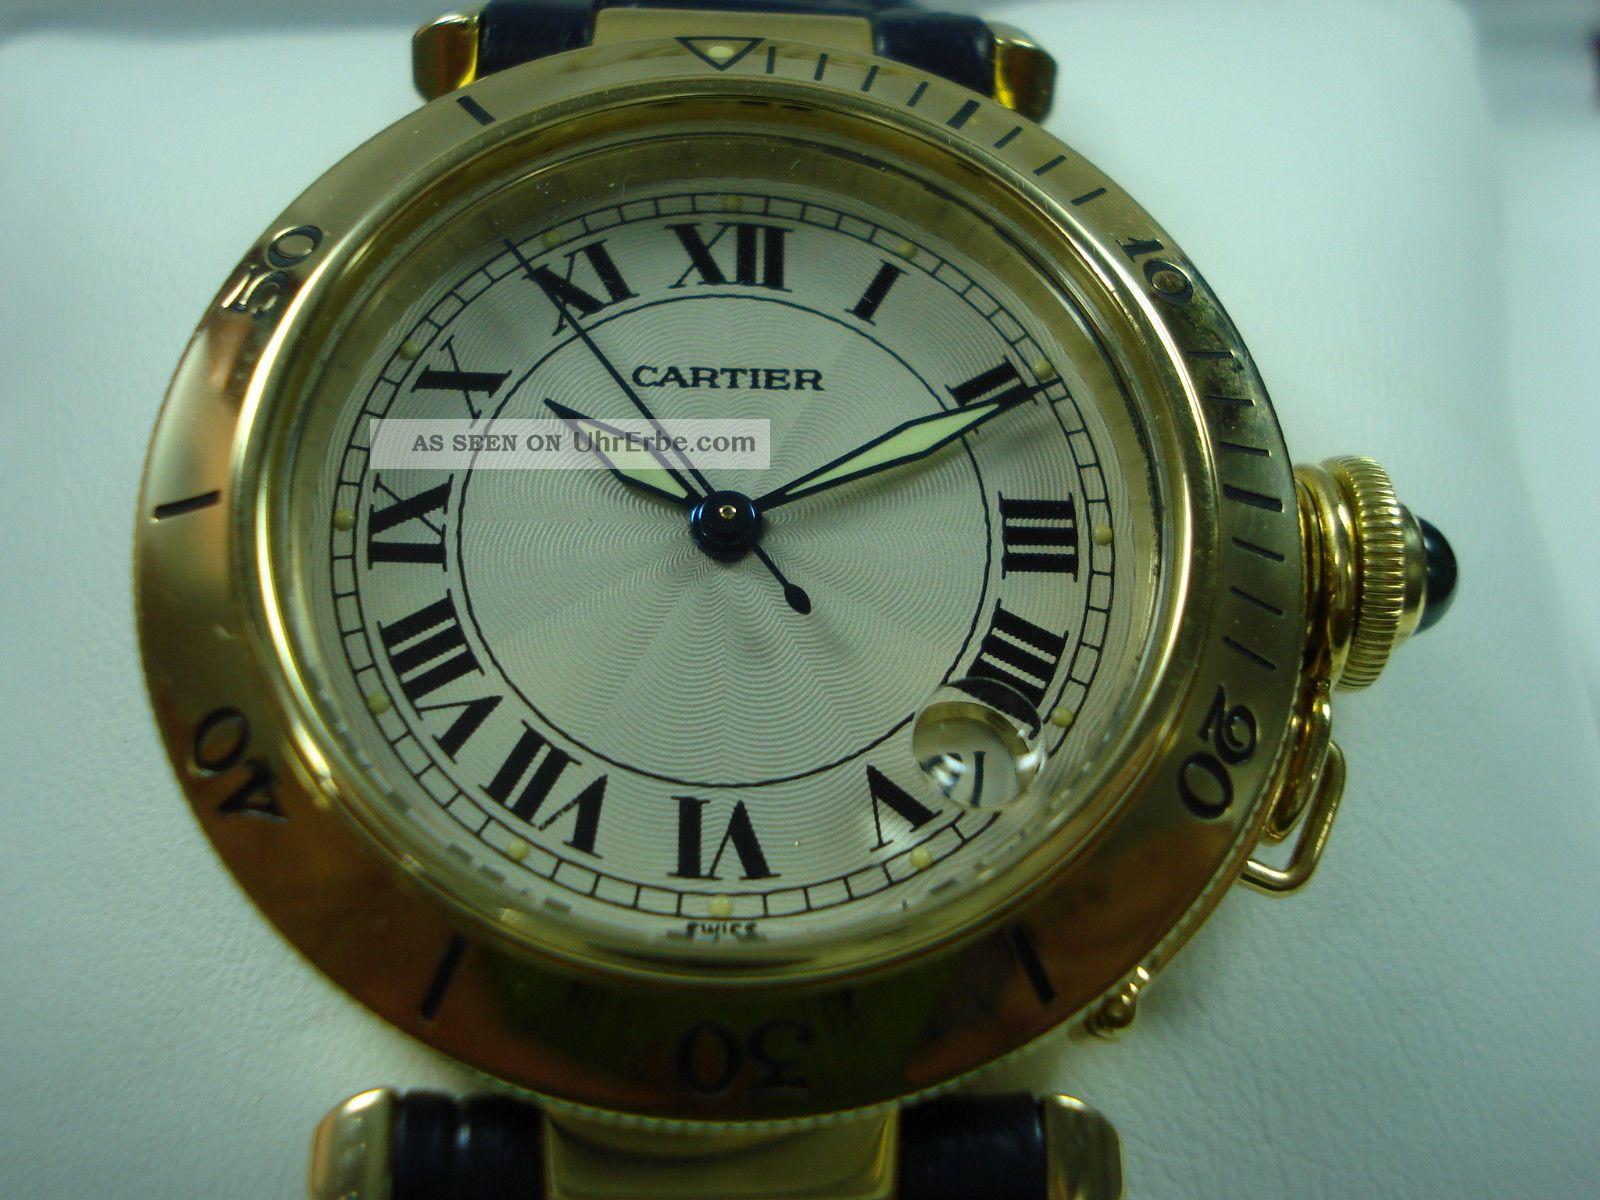 Cartier Pasha Armbanduhr In 18 Karat Gold Mit Cartier Uhrenbox Armbanduhren Bild